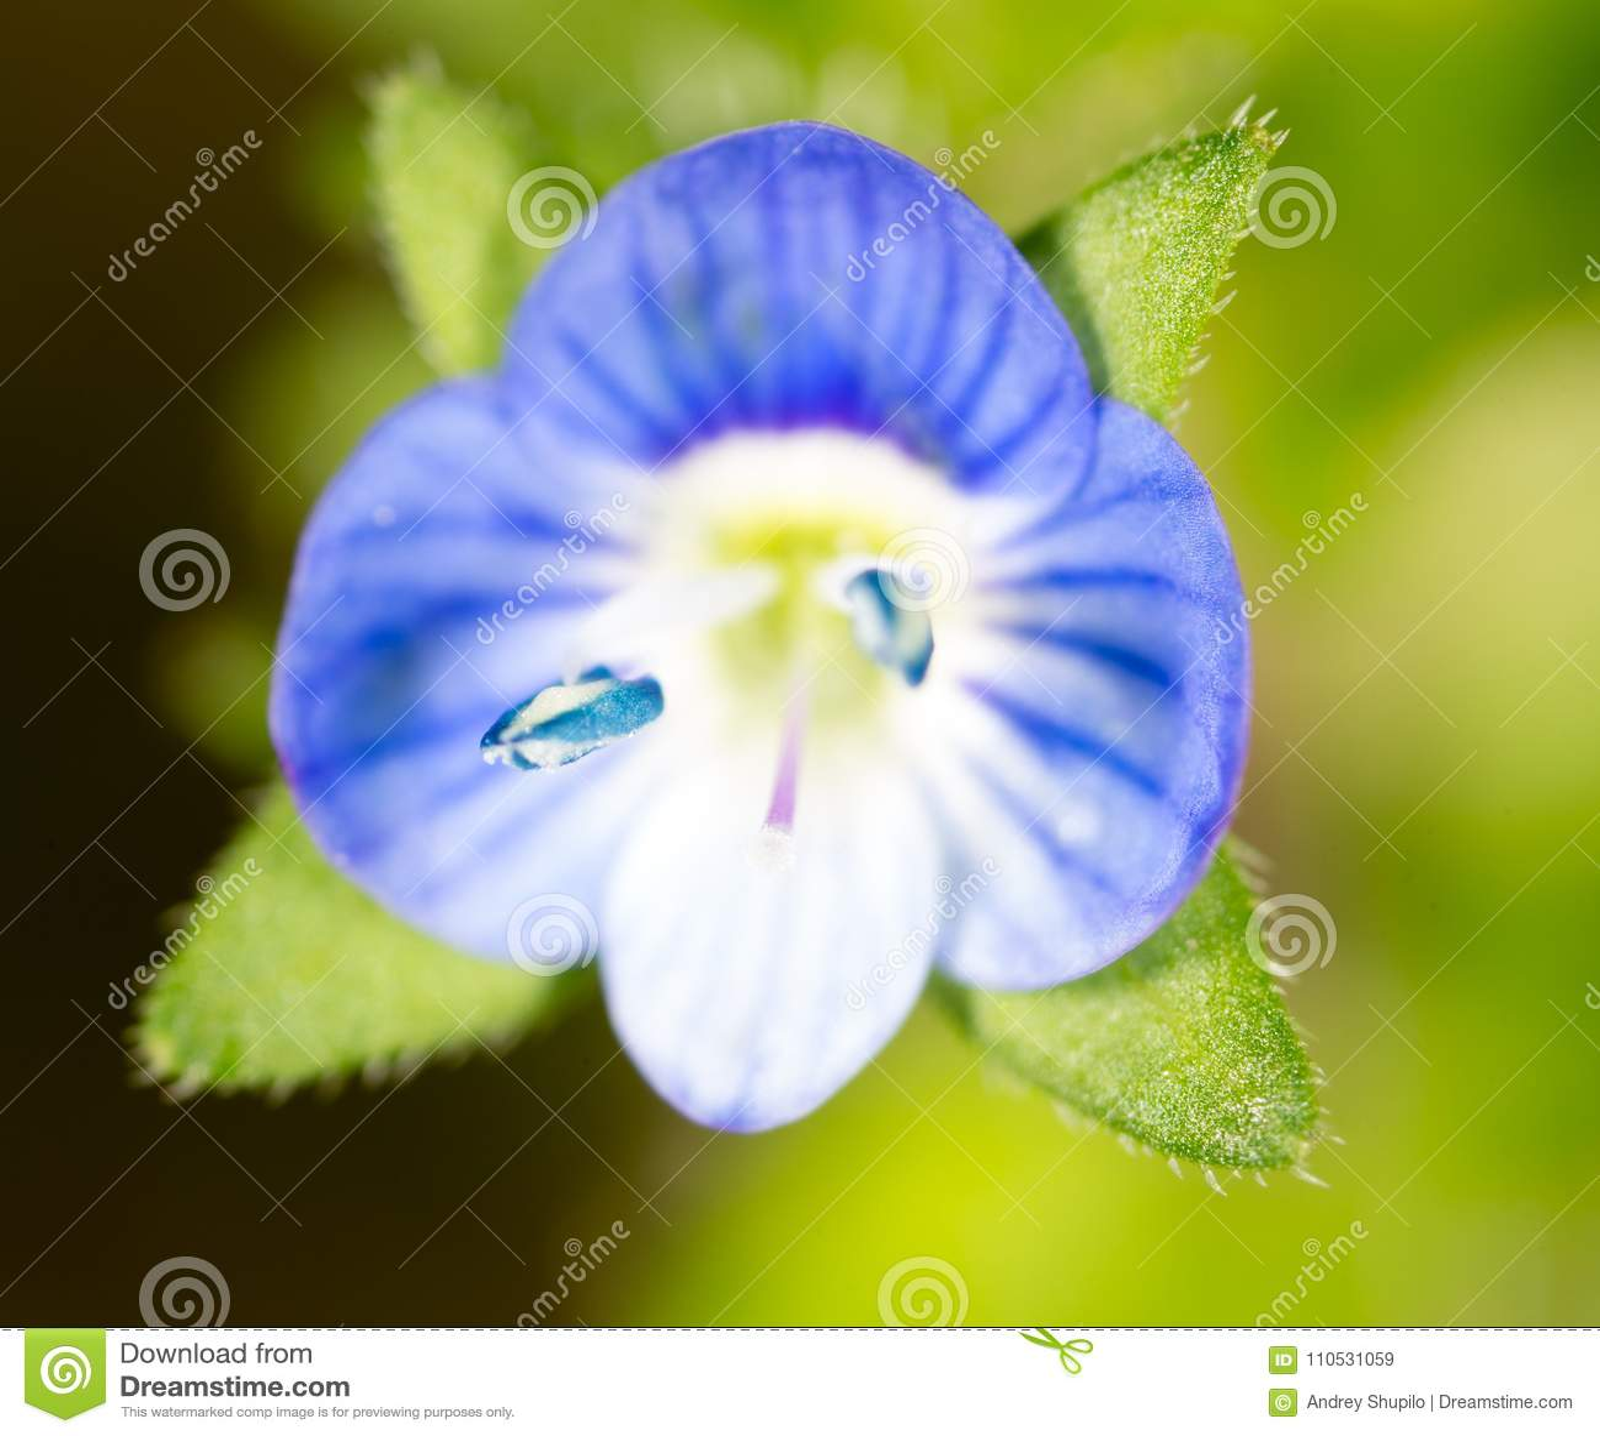 Small blue flower super macro stock image image of blossom download small blue flower super macro stock image image of blossom closeup izmirmasajfo